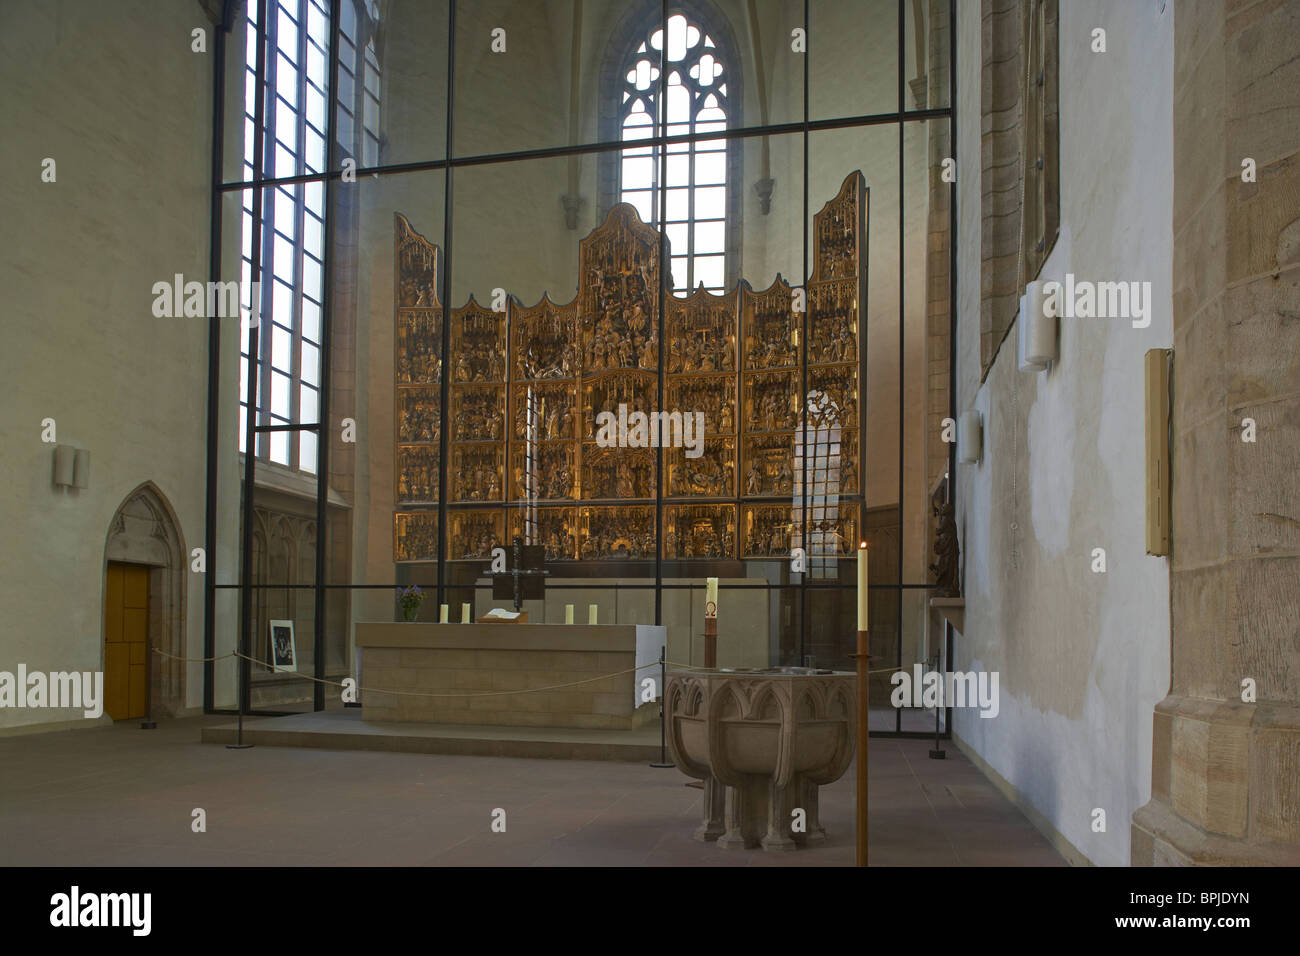 Petrikirche, Indoor photo, Dortmund, Ruhrgebiet, North Rhine-Westphalia, Germany, Europe - Stock Image